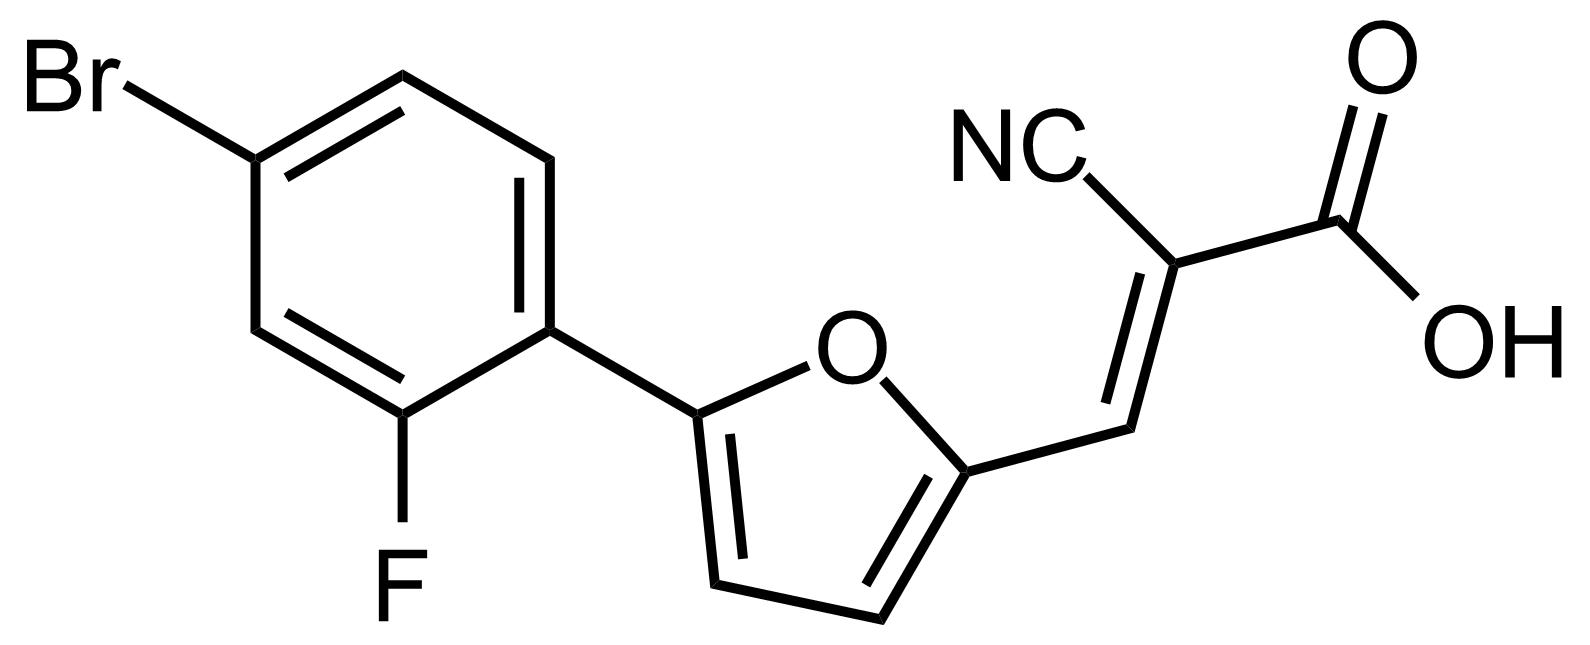 Structure of (E)-3-(5-(4-Bromo-2-fluorophenyl)furan-2-yl)-2-cyanoacrylic acid